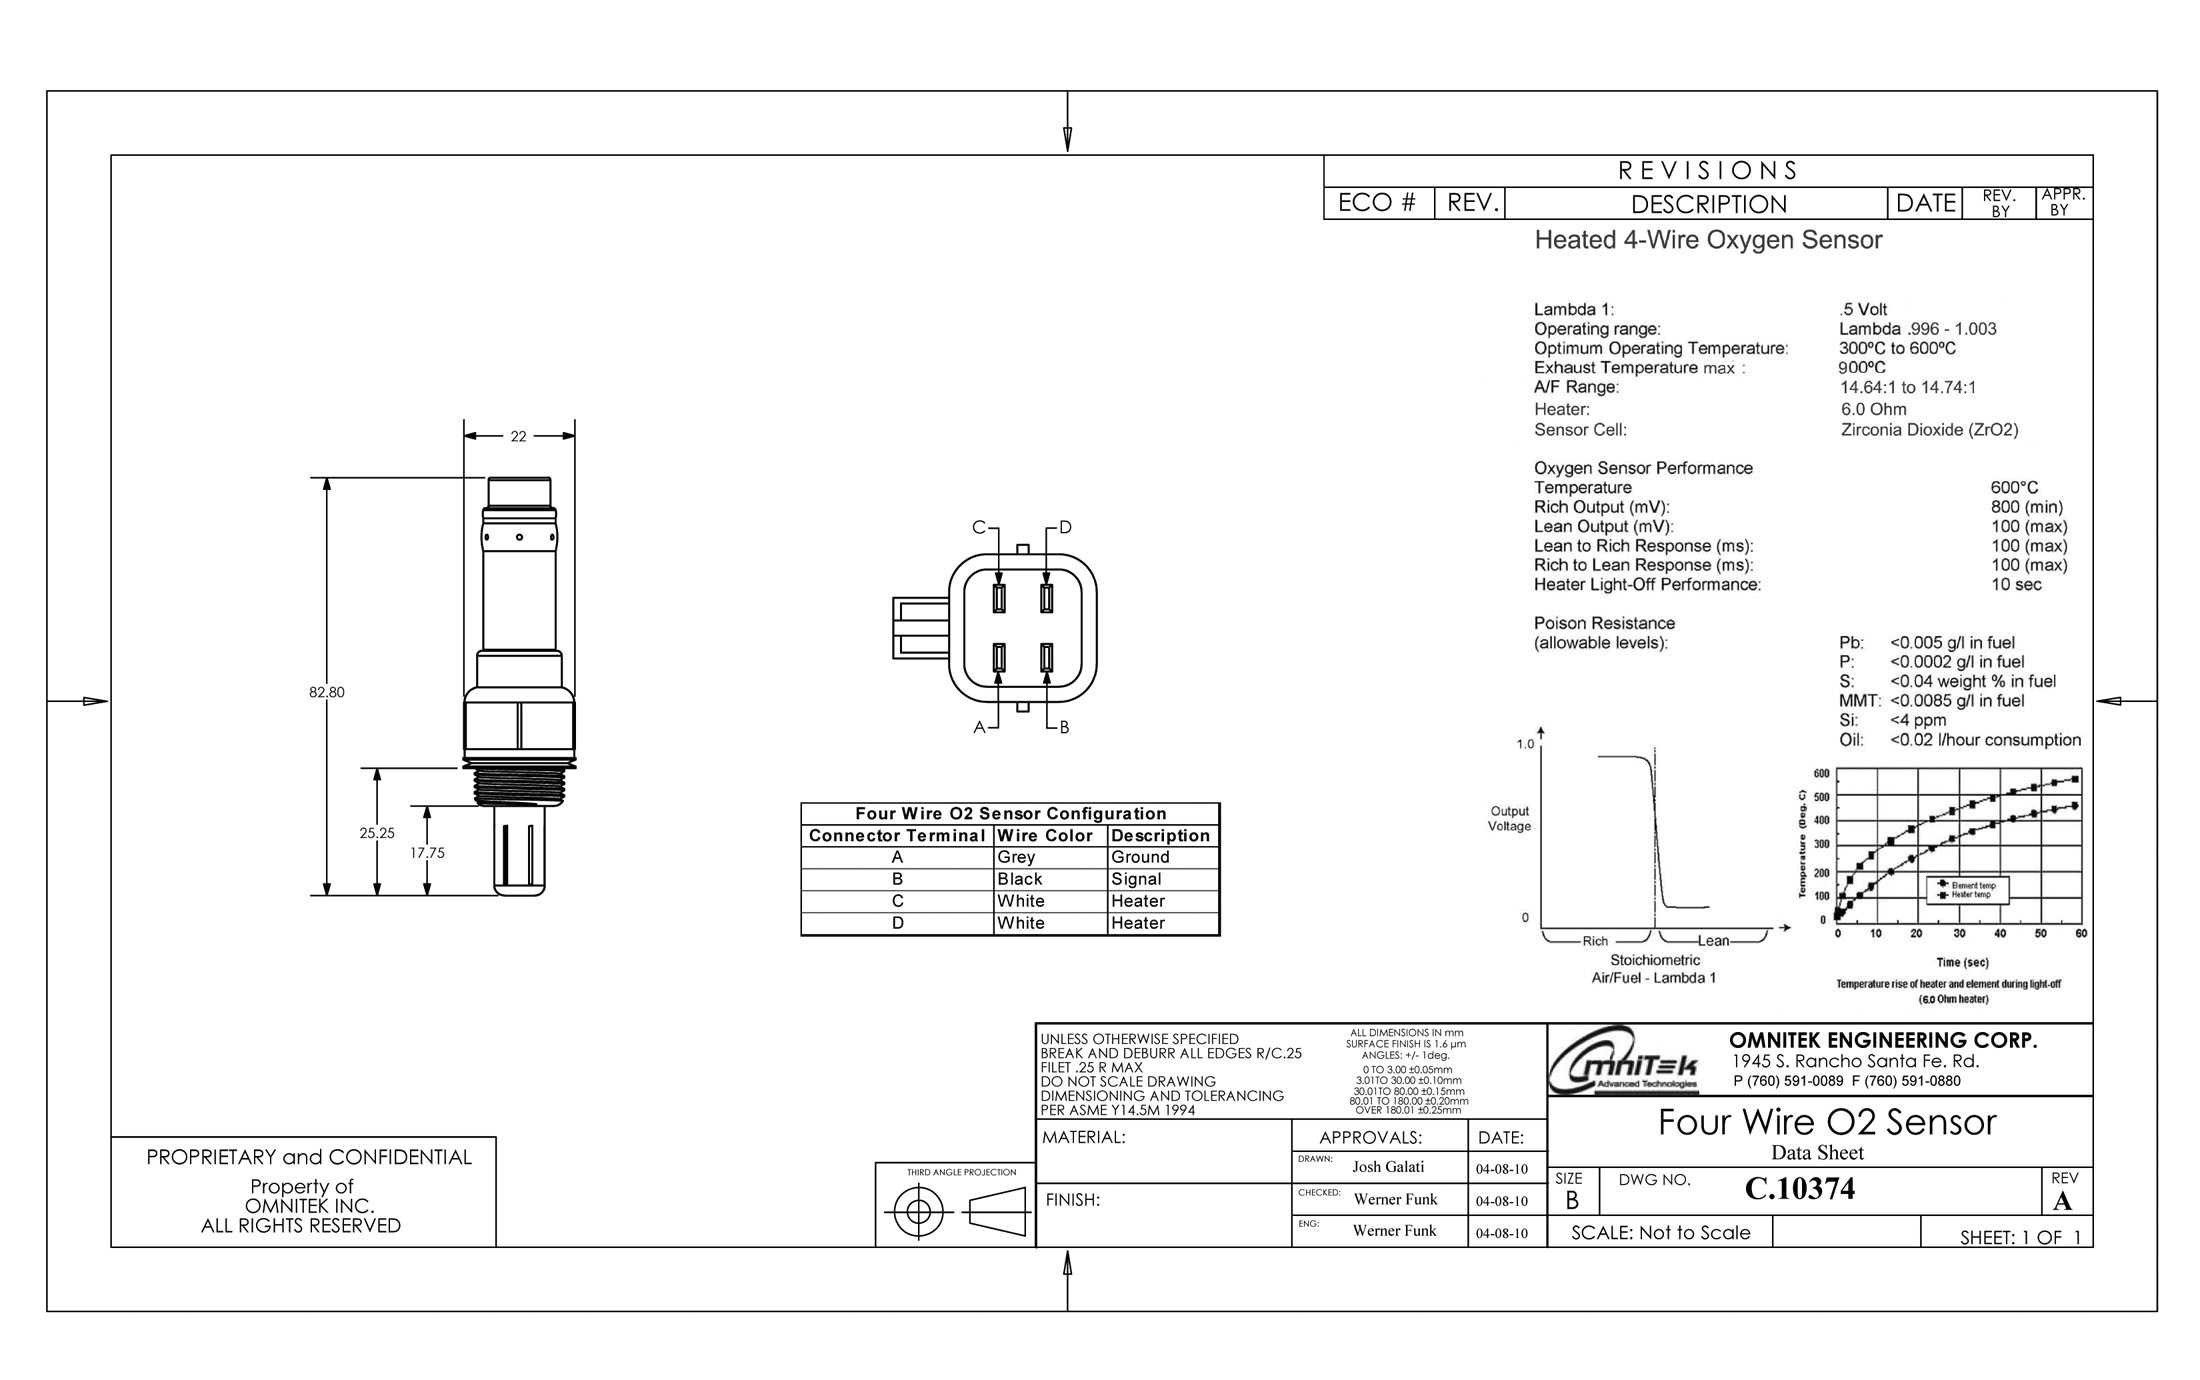 bosch sensor wiring diagram wiring diagram sheet wiring diagram for 4 wire oxygen sensor